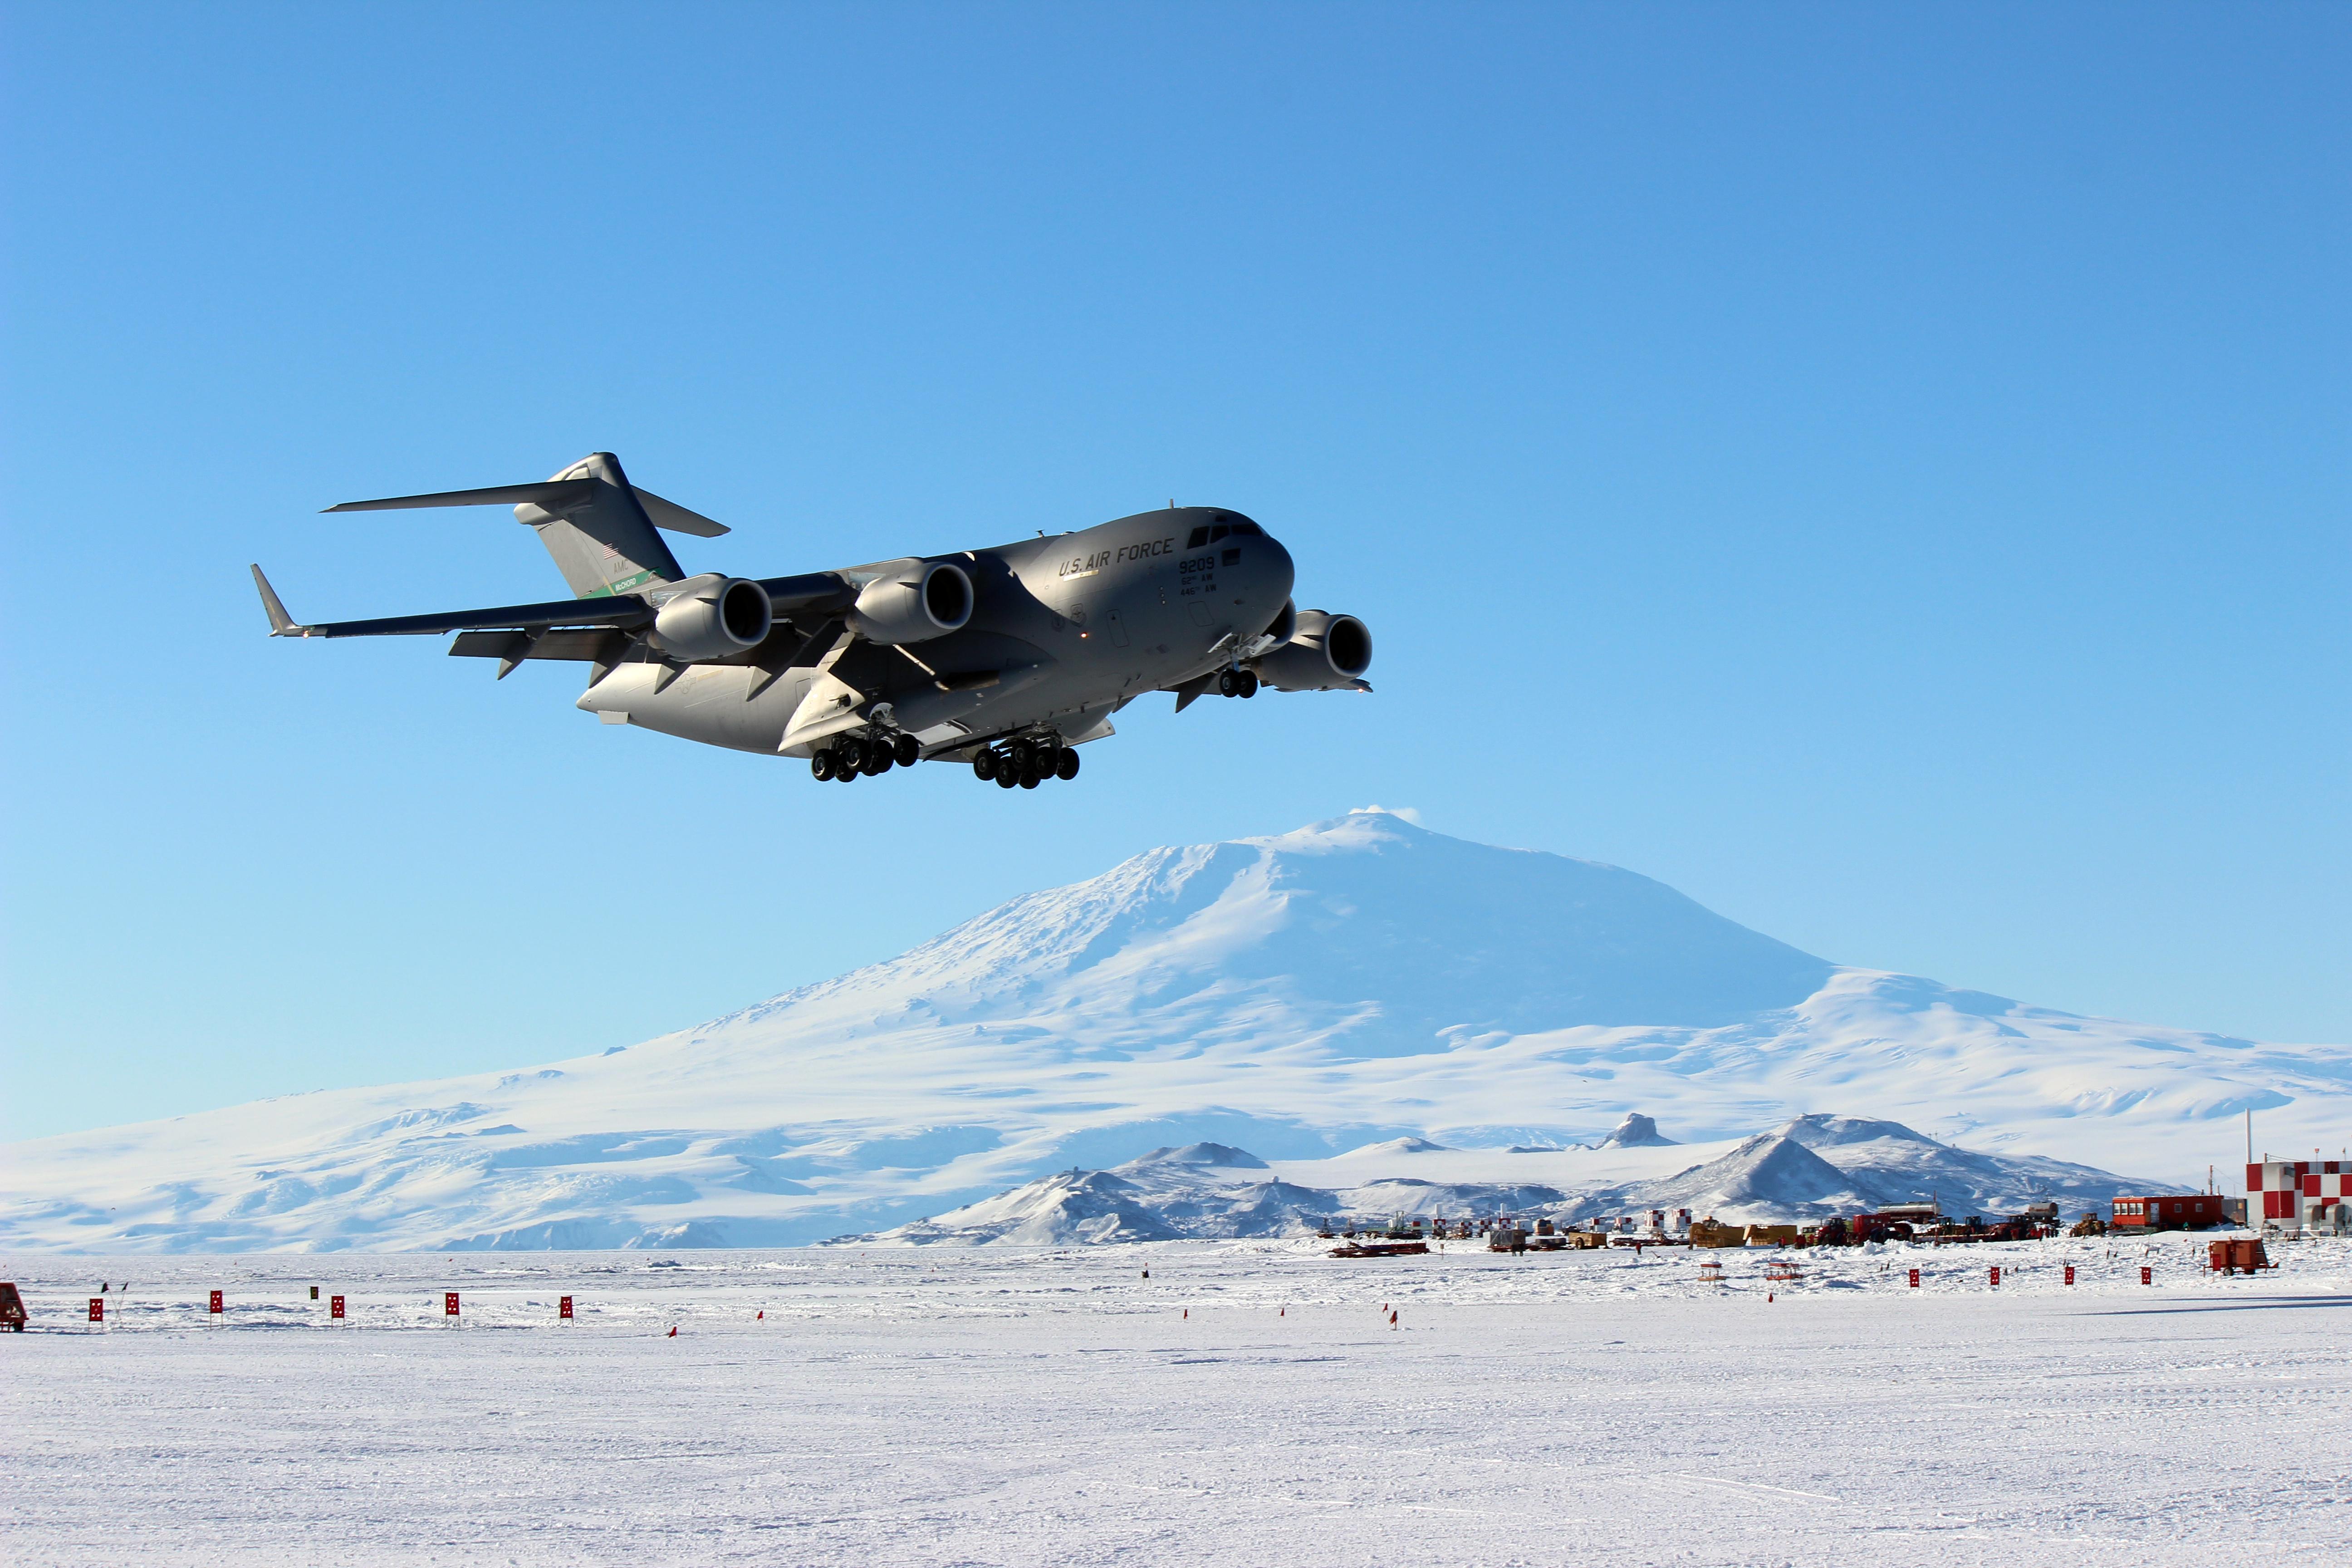 C130 C5 C17 Airlifters Prompt Washington Debate